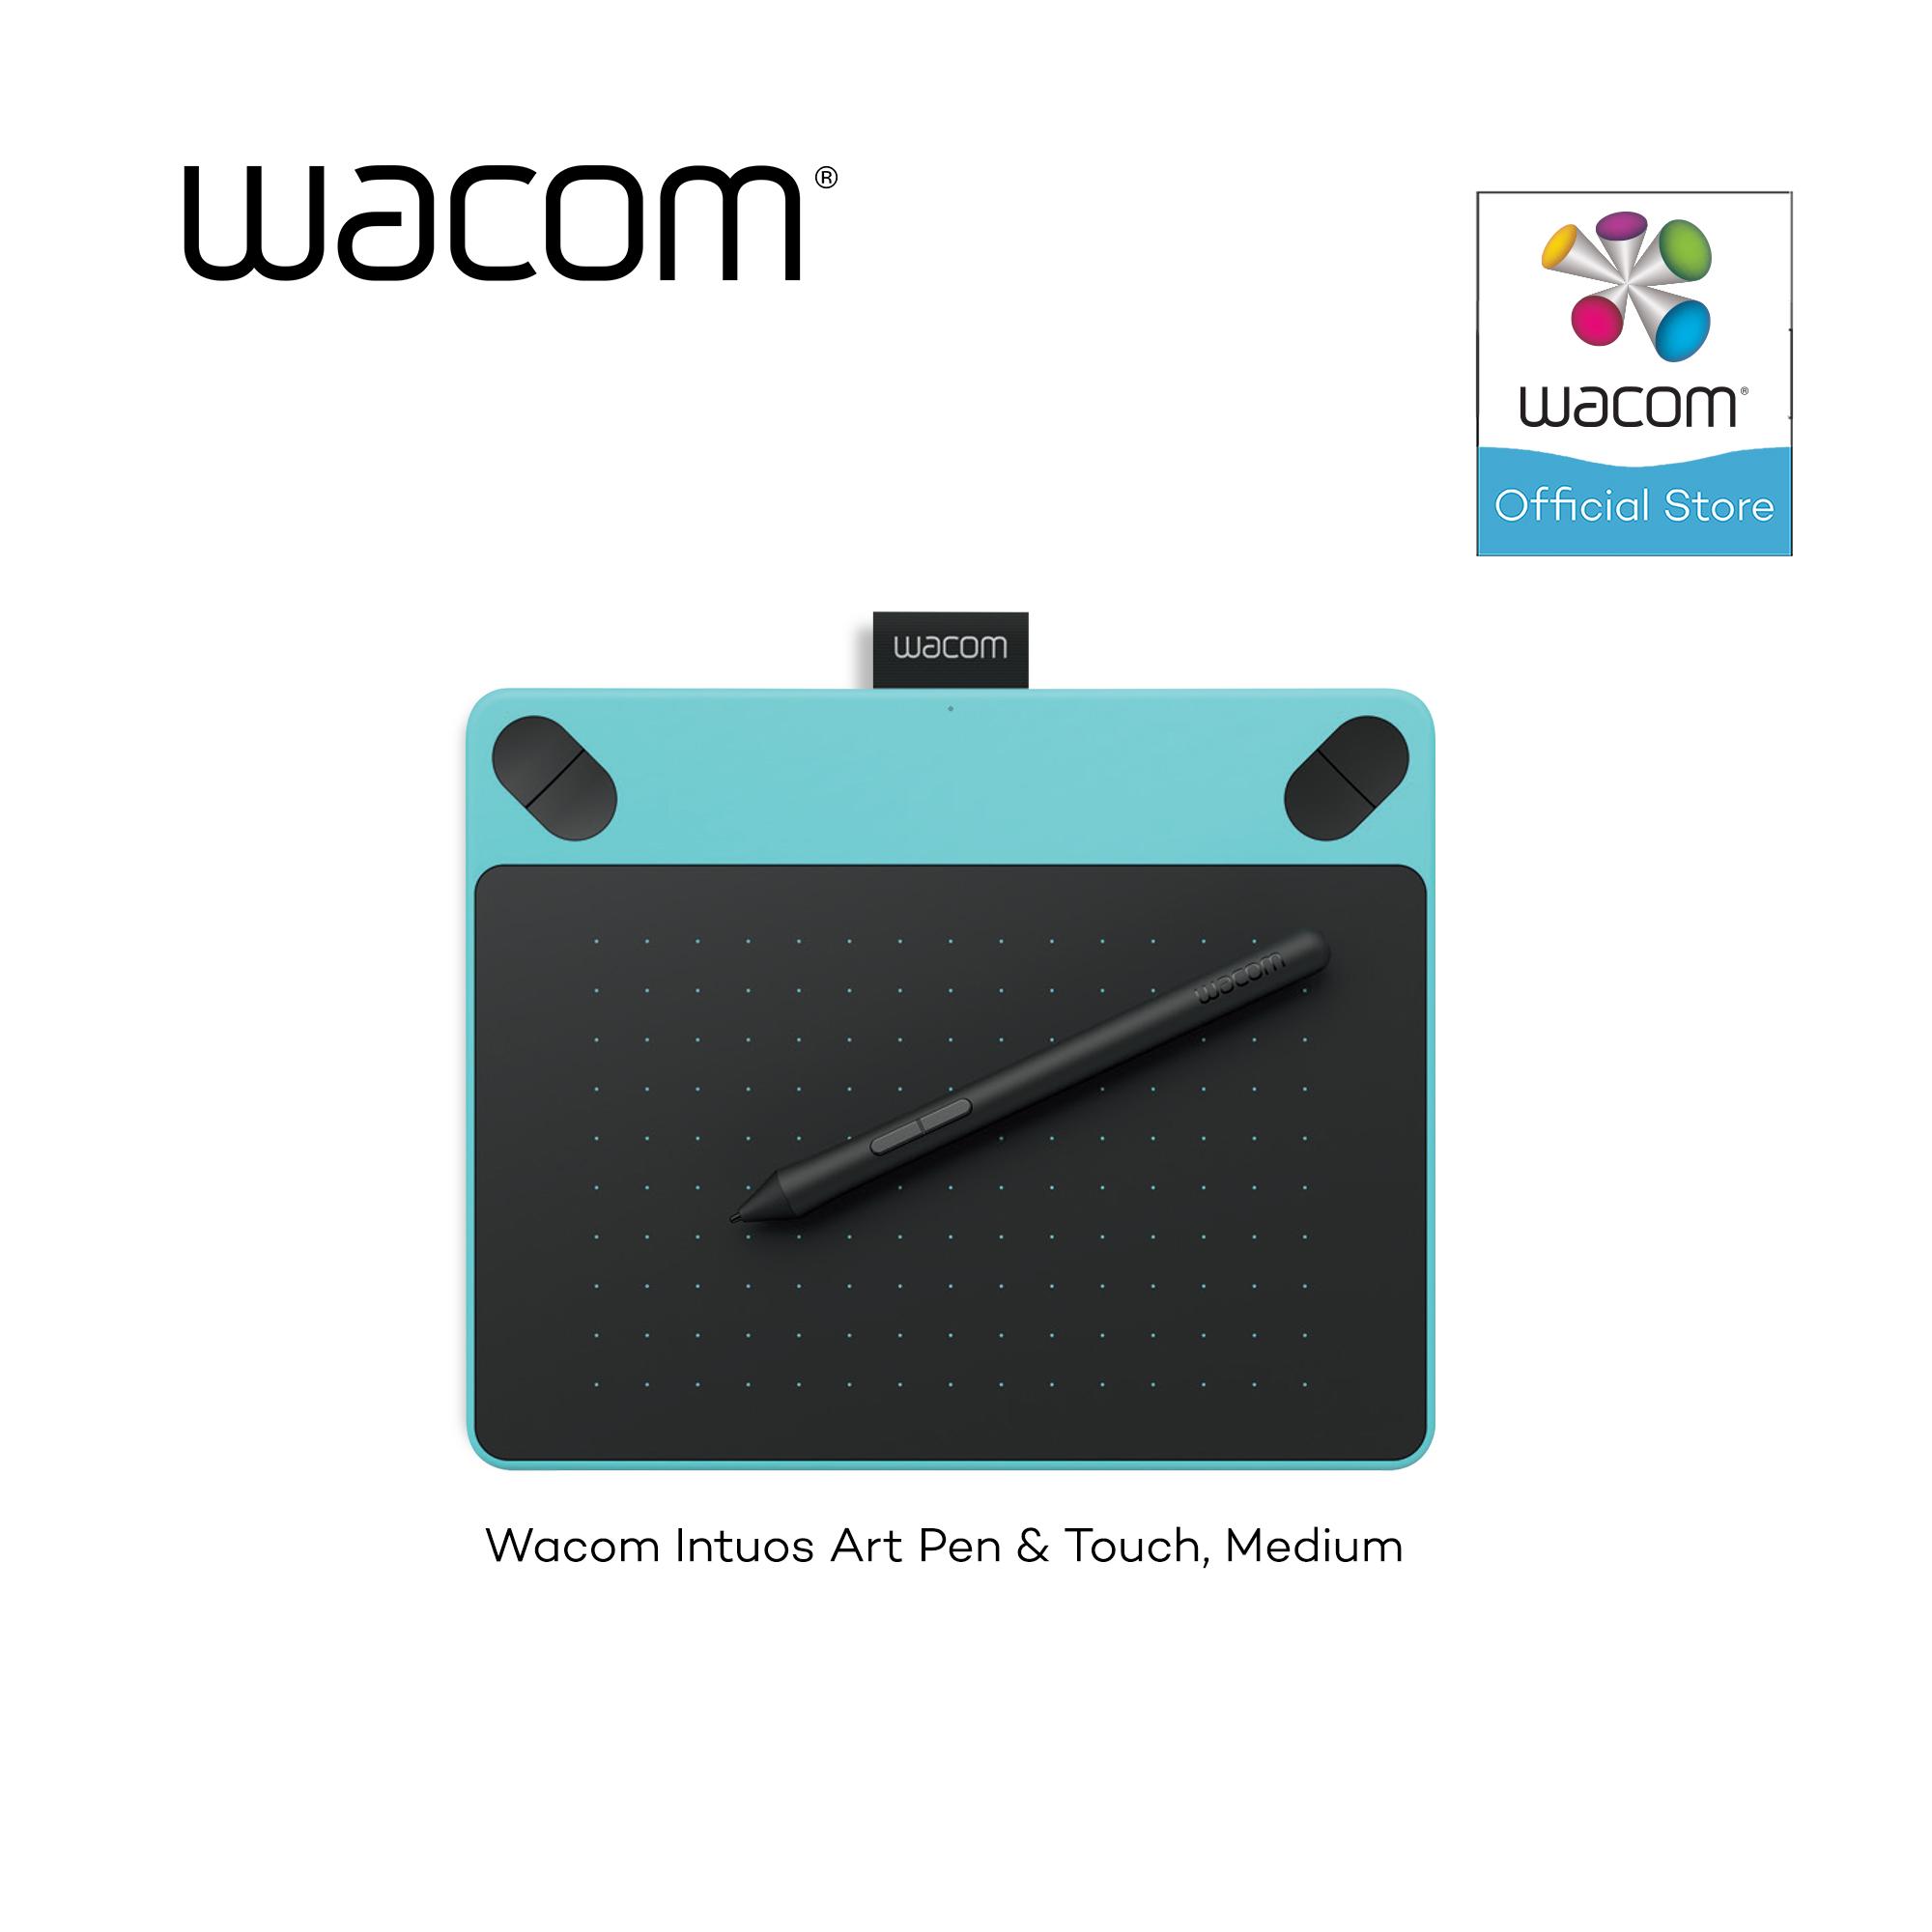 CLEARANCE SALE: Intuos Art Pen & Touch Medium